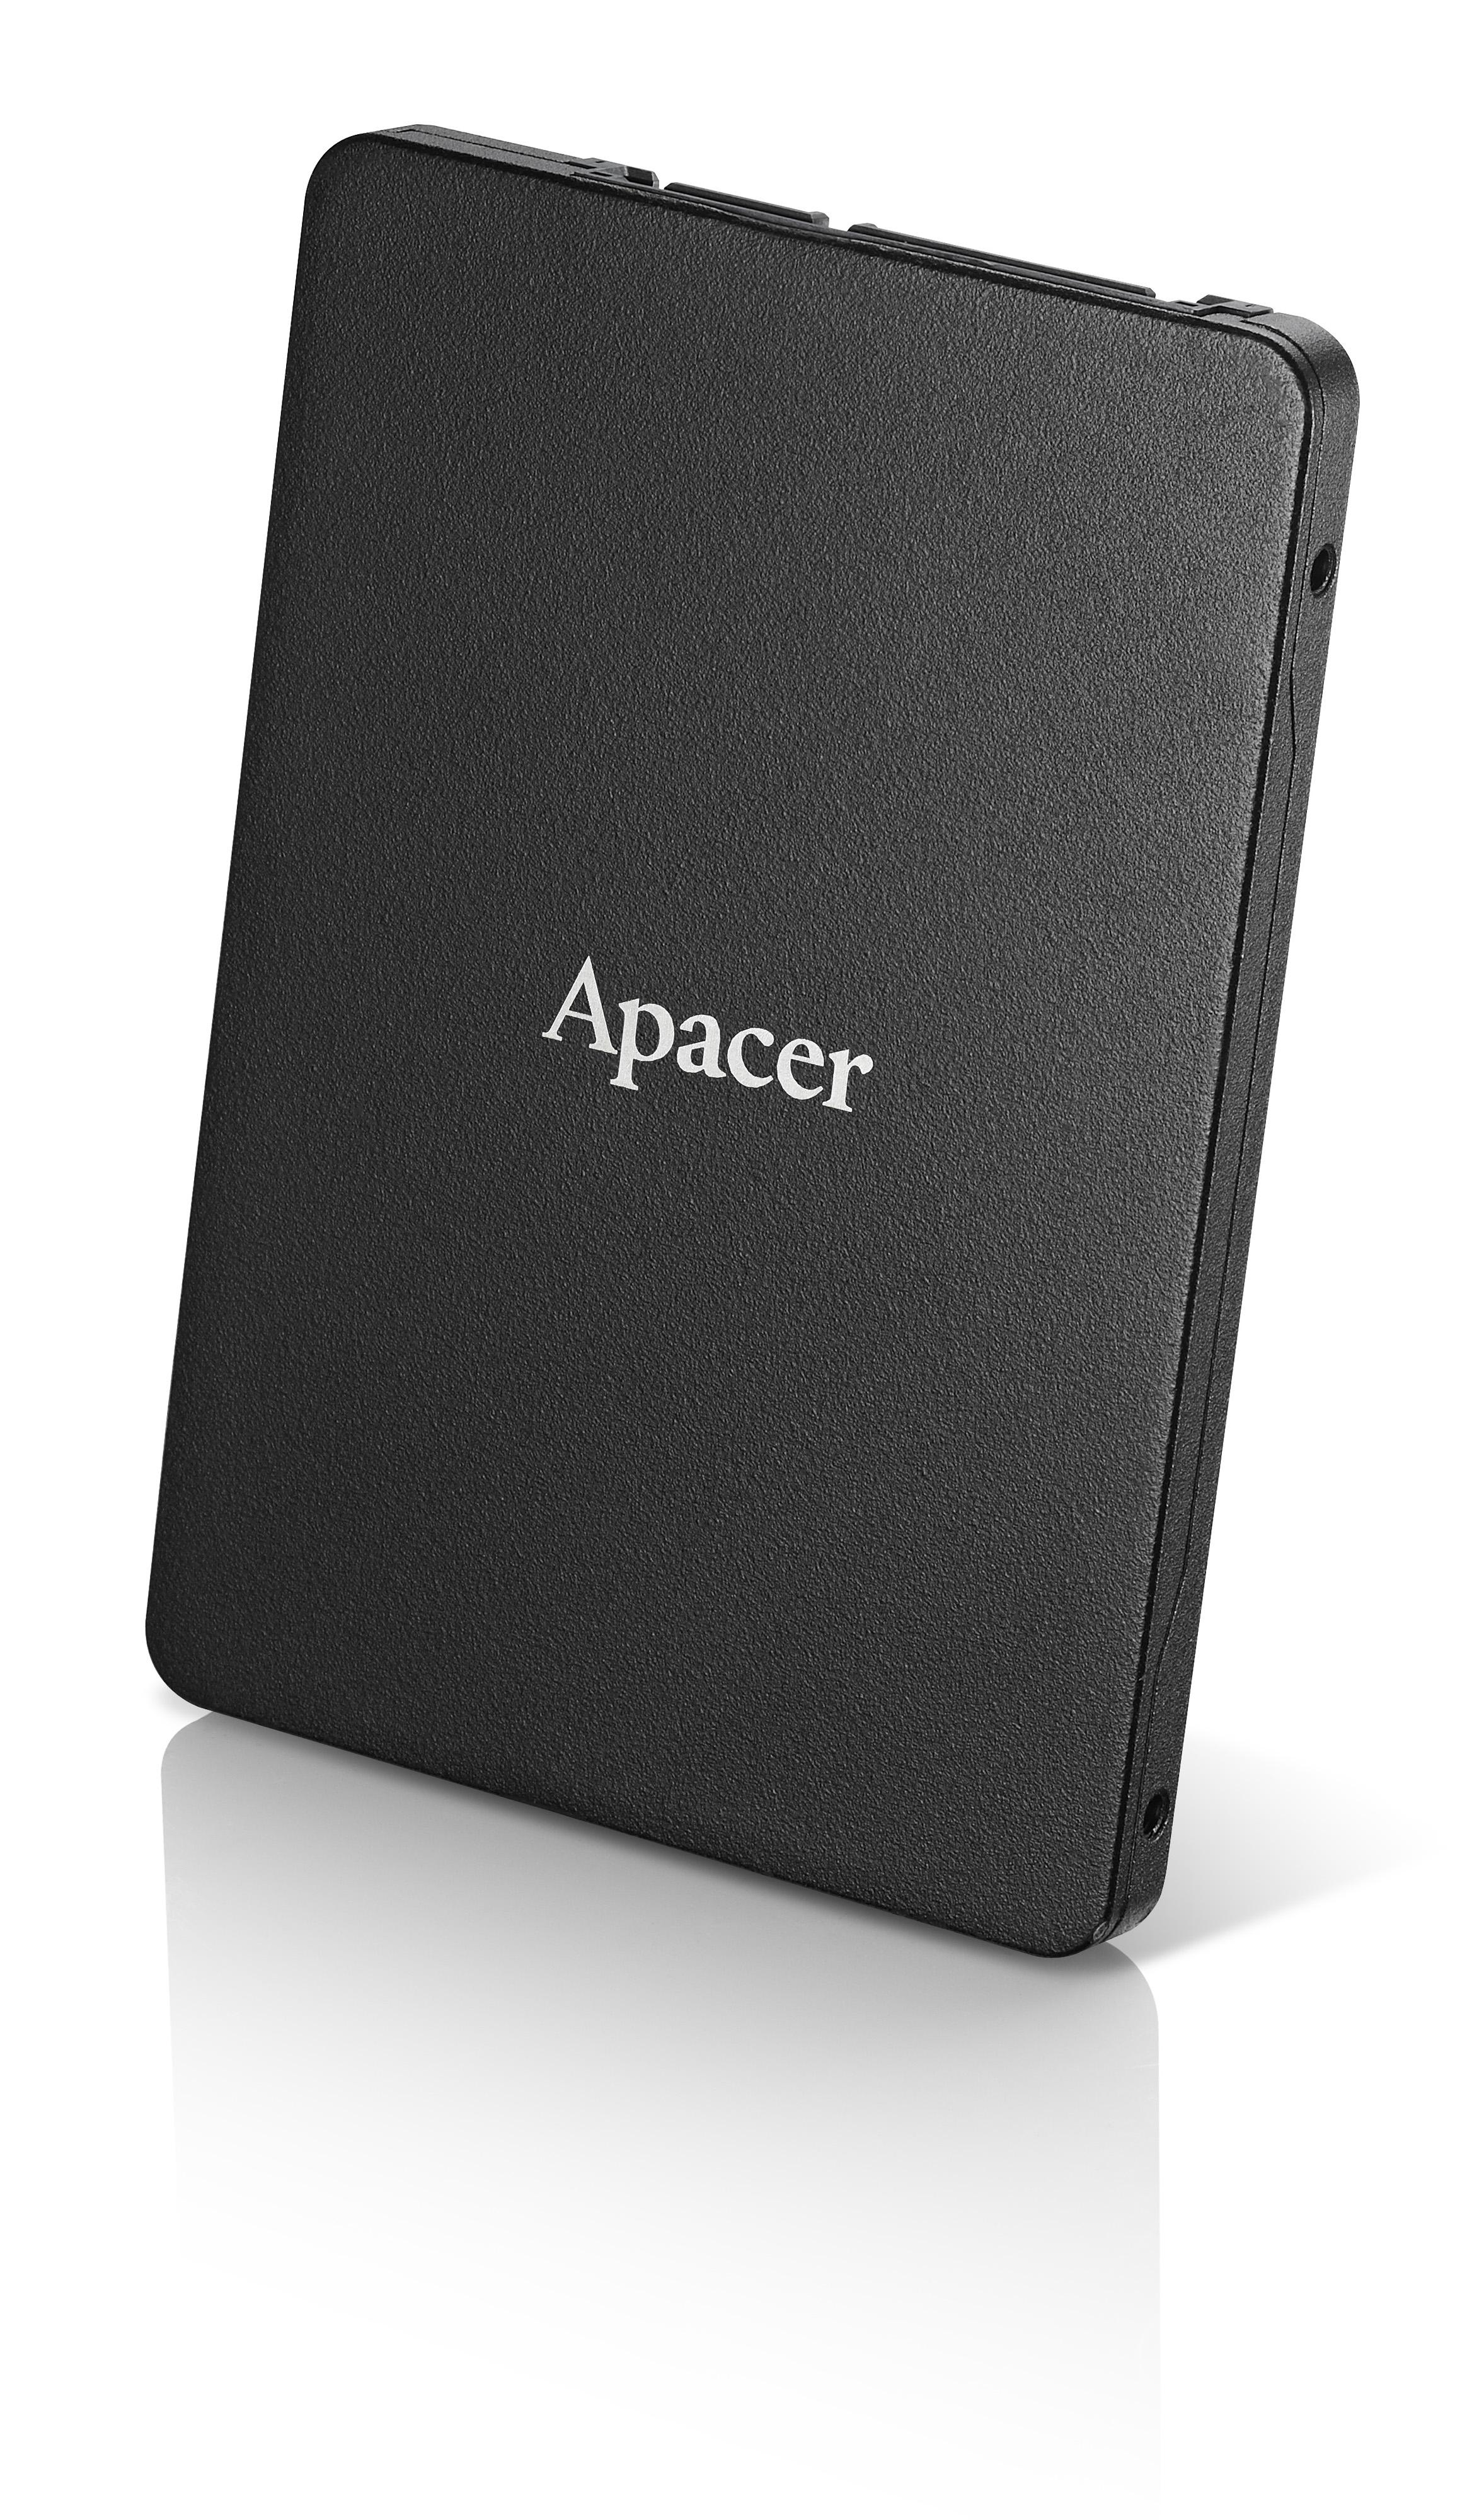 Apacer SFD 25H 2 lo - Apacer tung ổ cứng SSD SATA 3